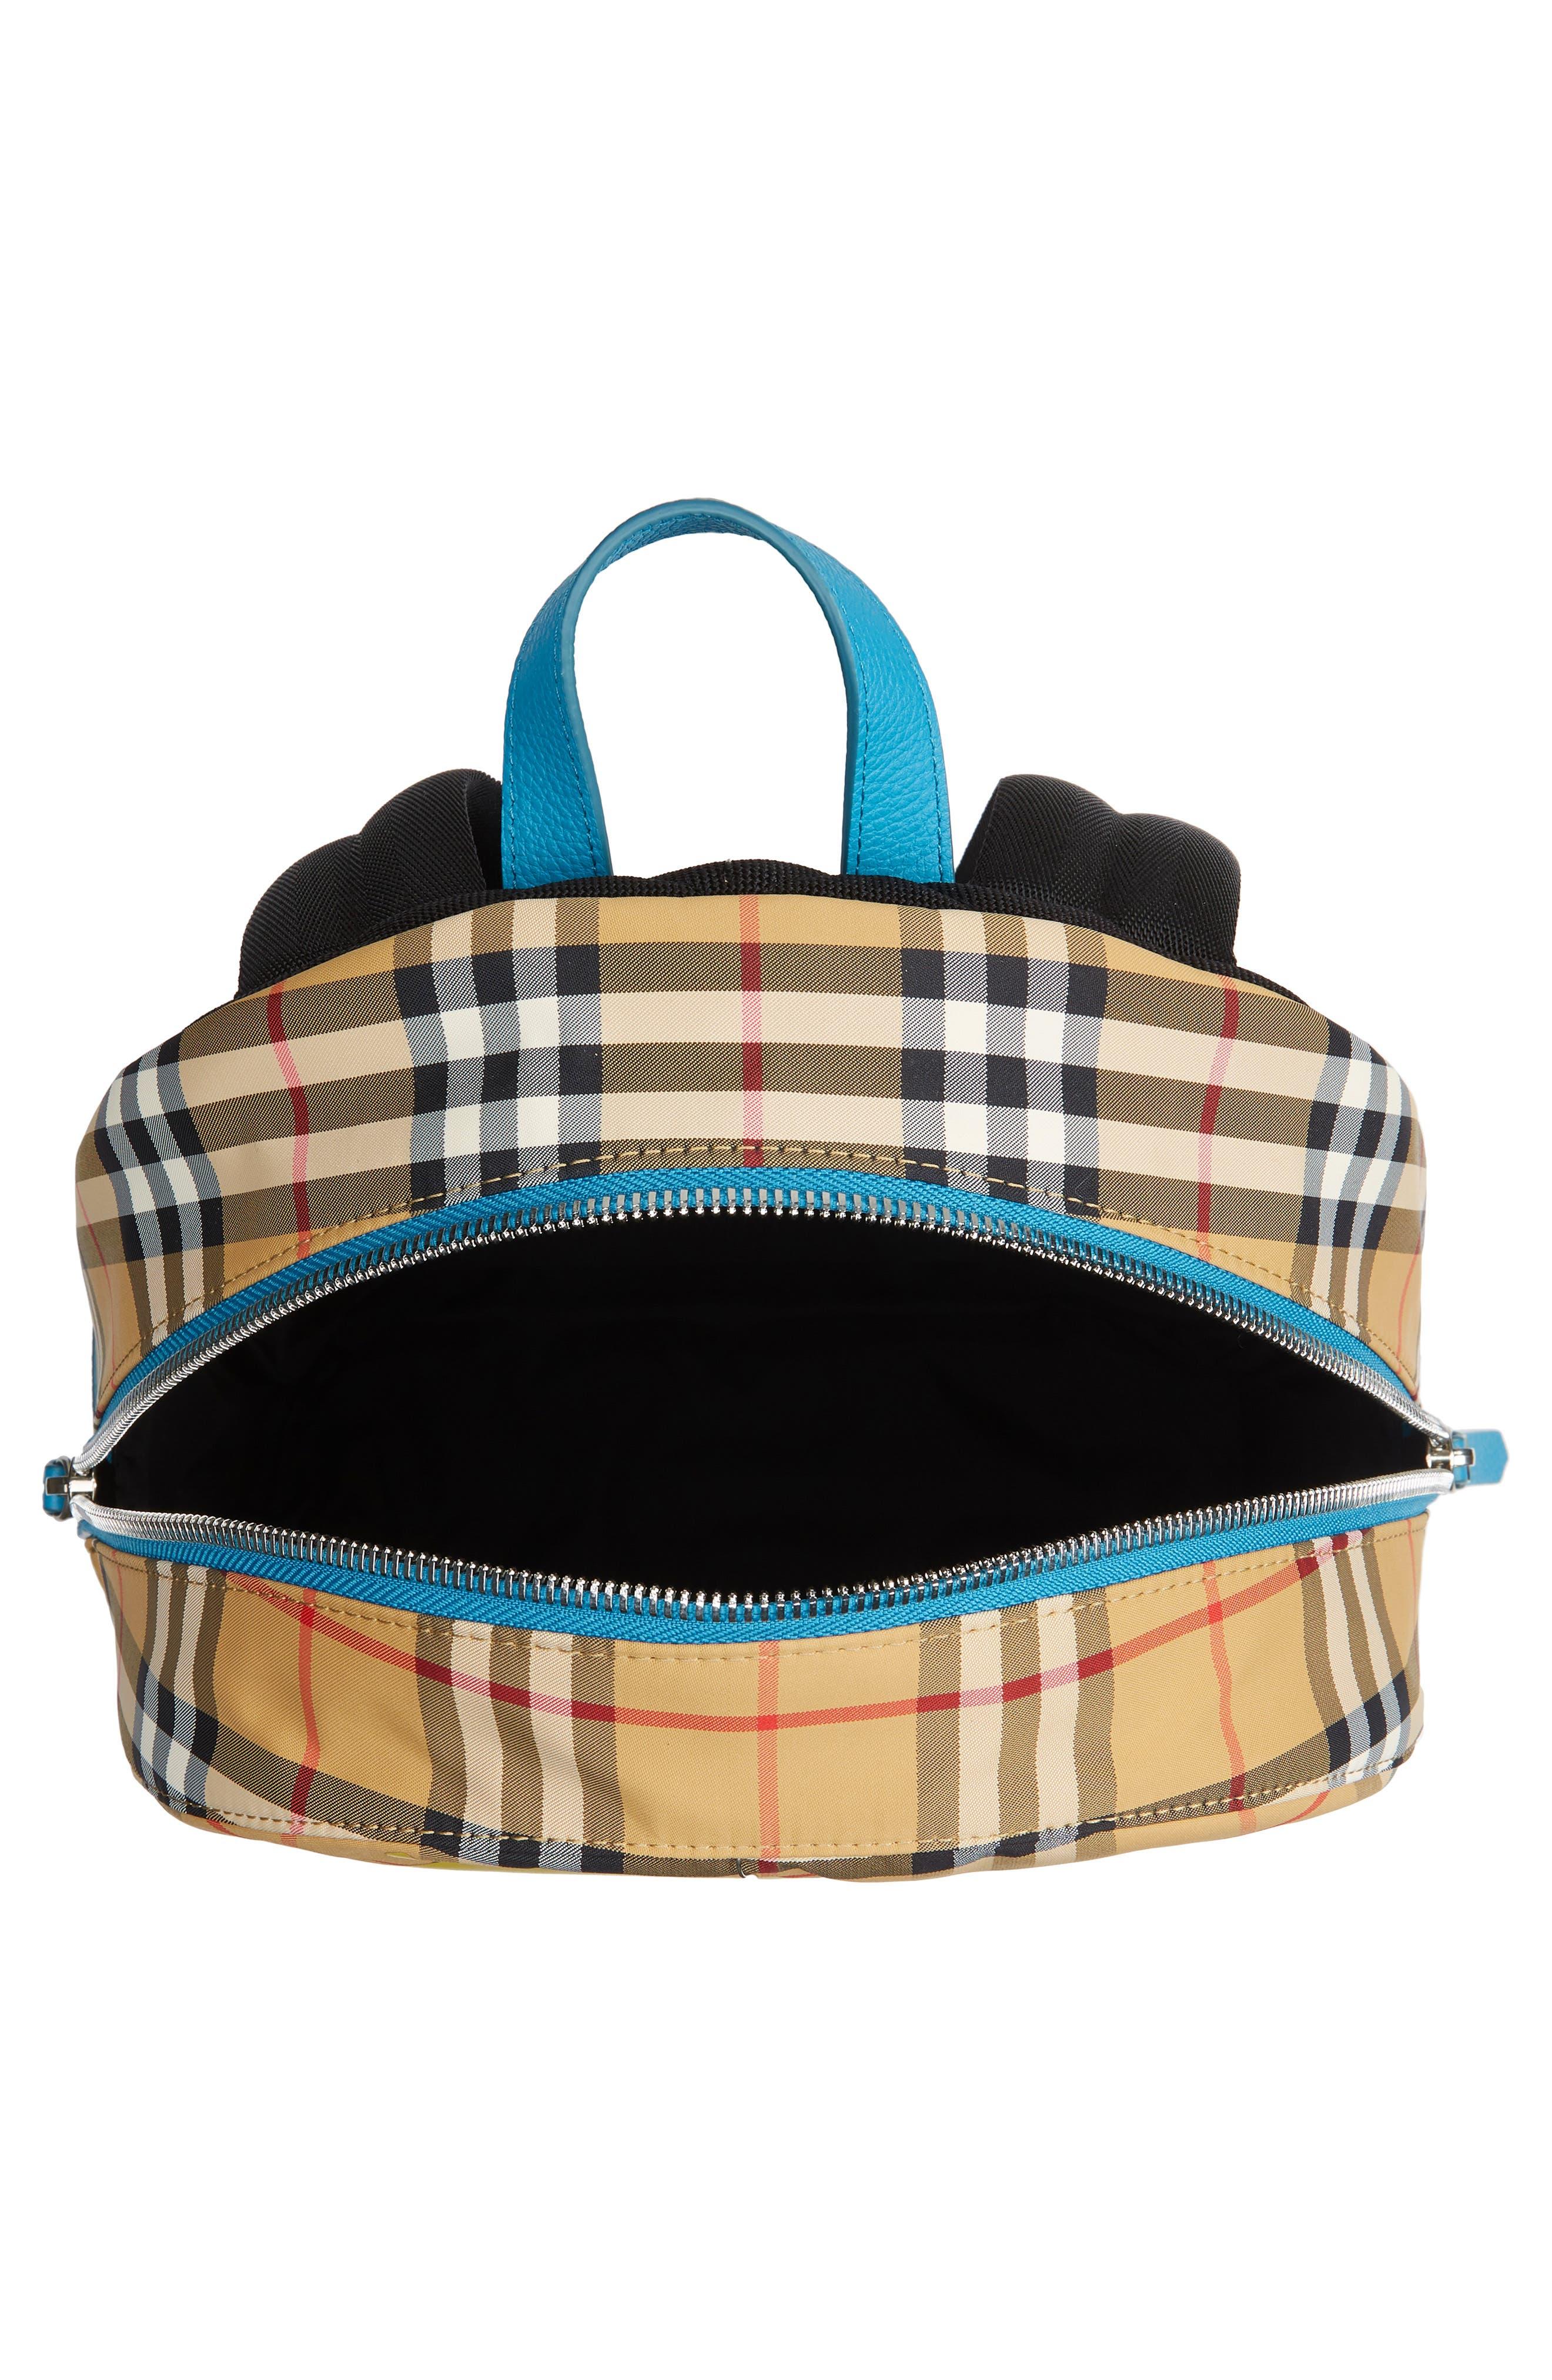 BURBERRY,                             Nico Sun Check Nylon Backpack,                             Alternate thumbnail 4, color,                             ANTIQUE YELLW IP CHK